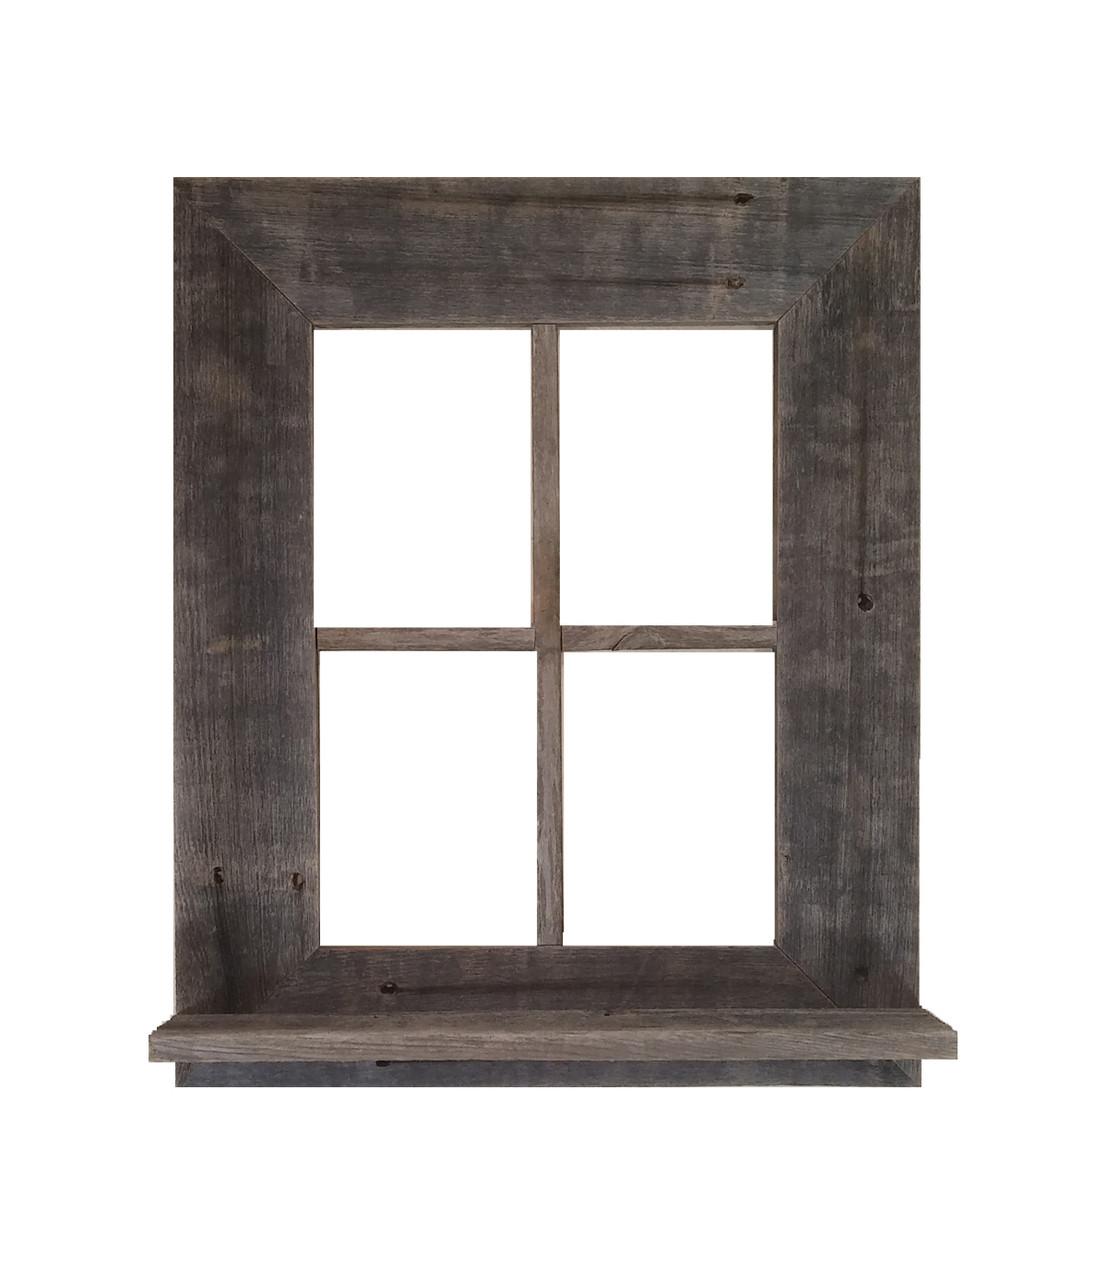 Rustic Barn Wood Window Frame With Shelf Rustic Decor